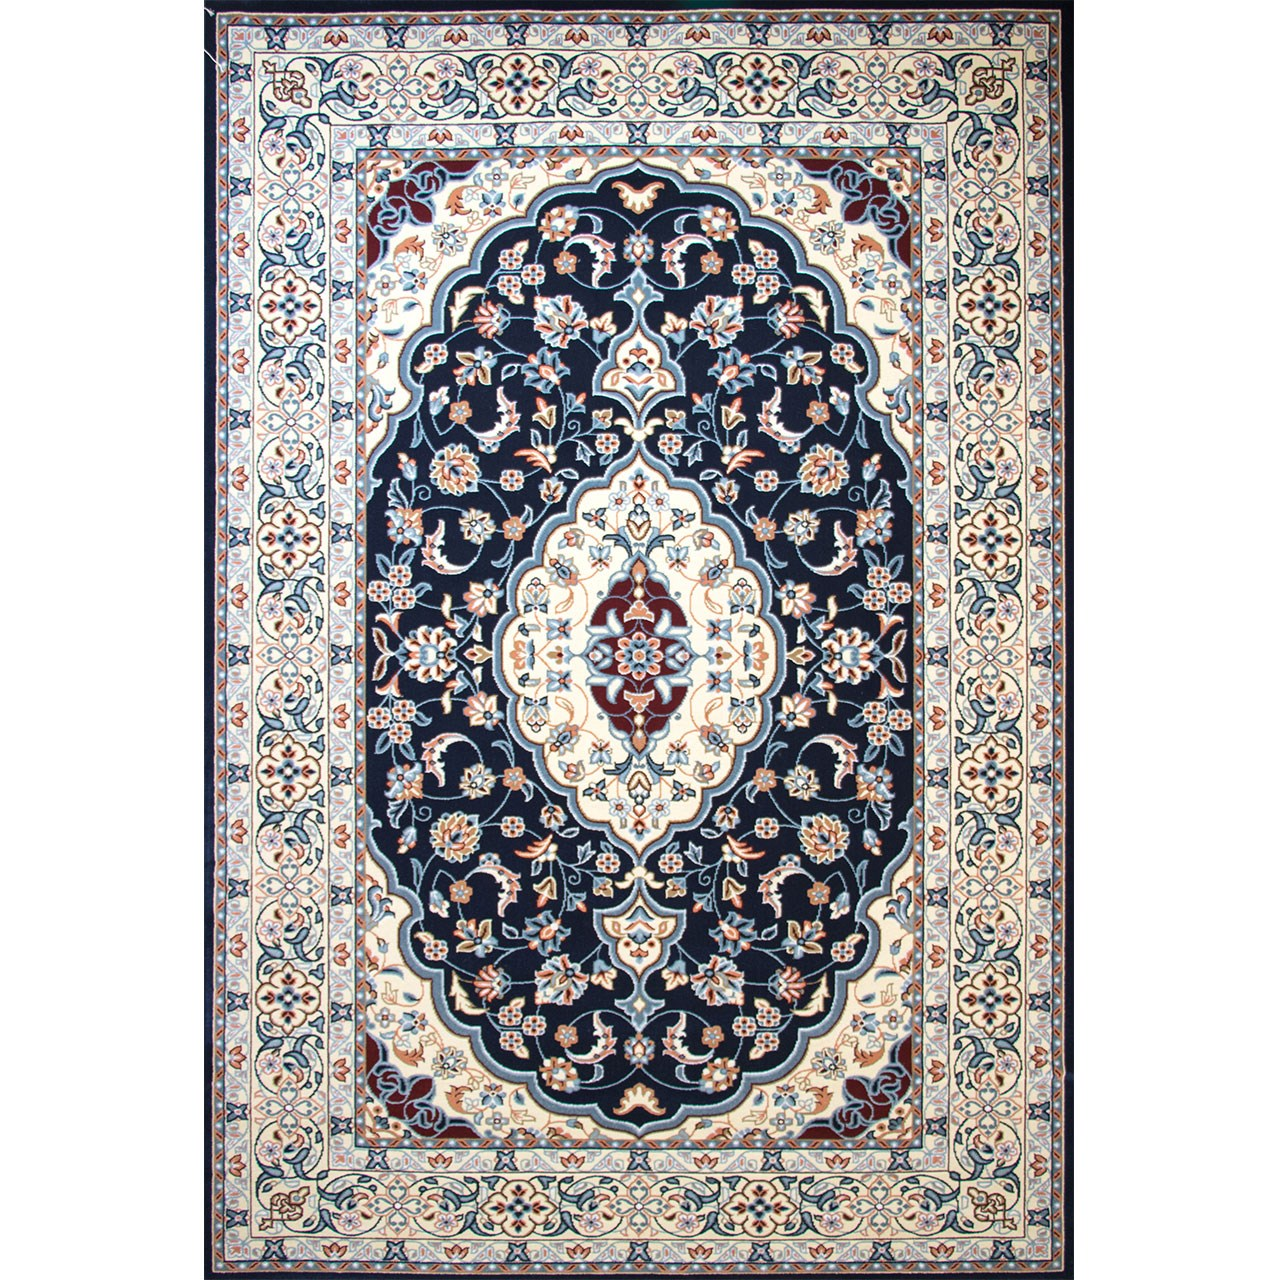 فرش ماشینی ساوین کد 2104 زمینه سرمه ای